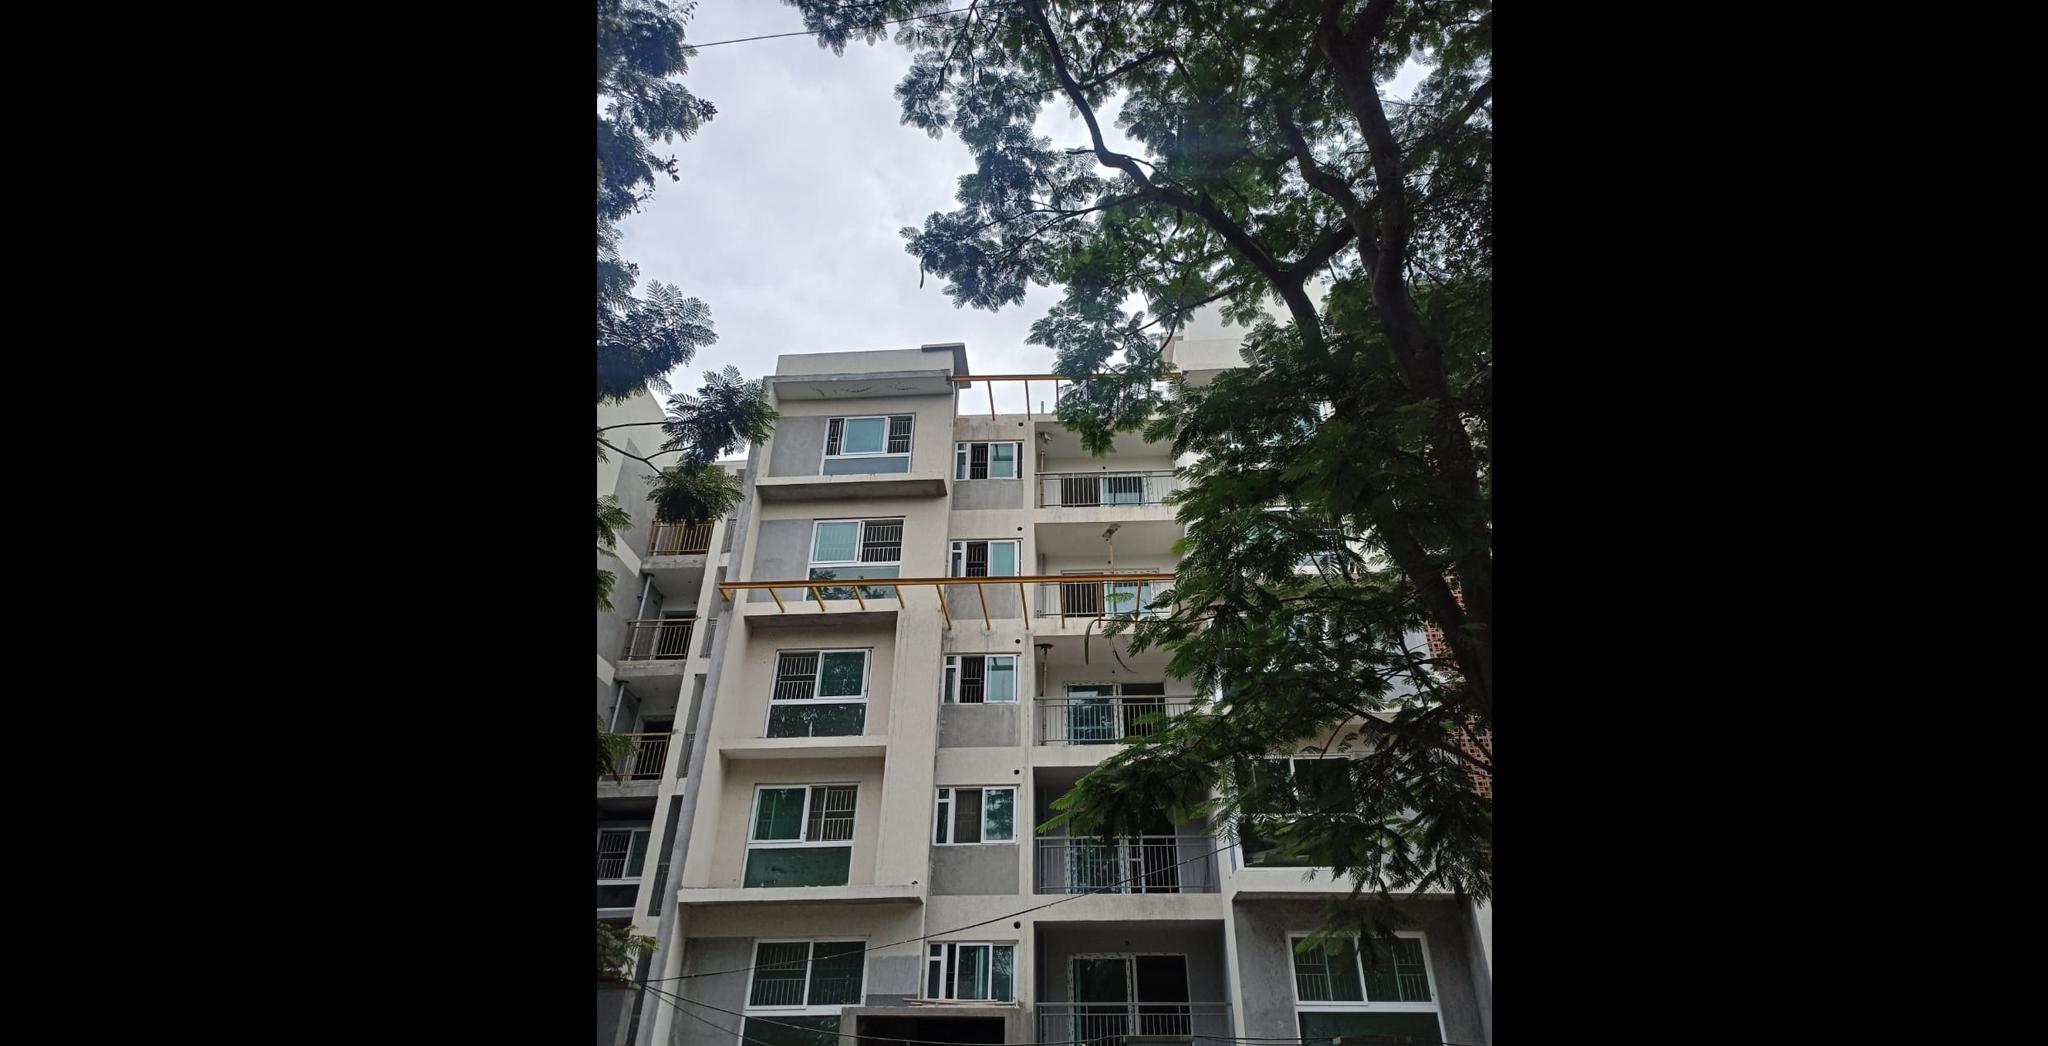 Sep 2021 - A block windows